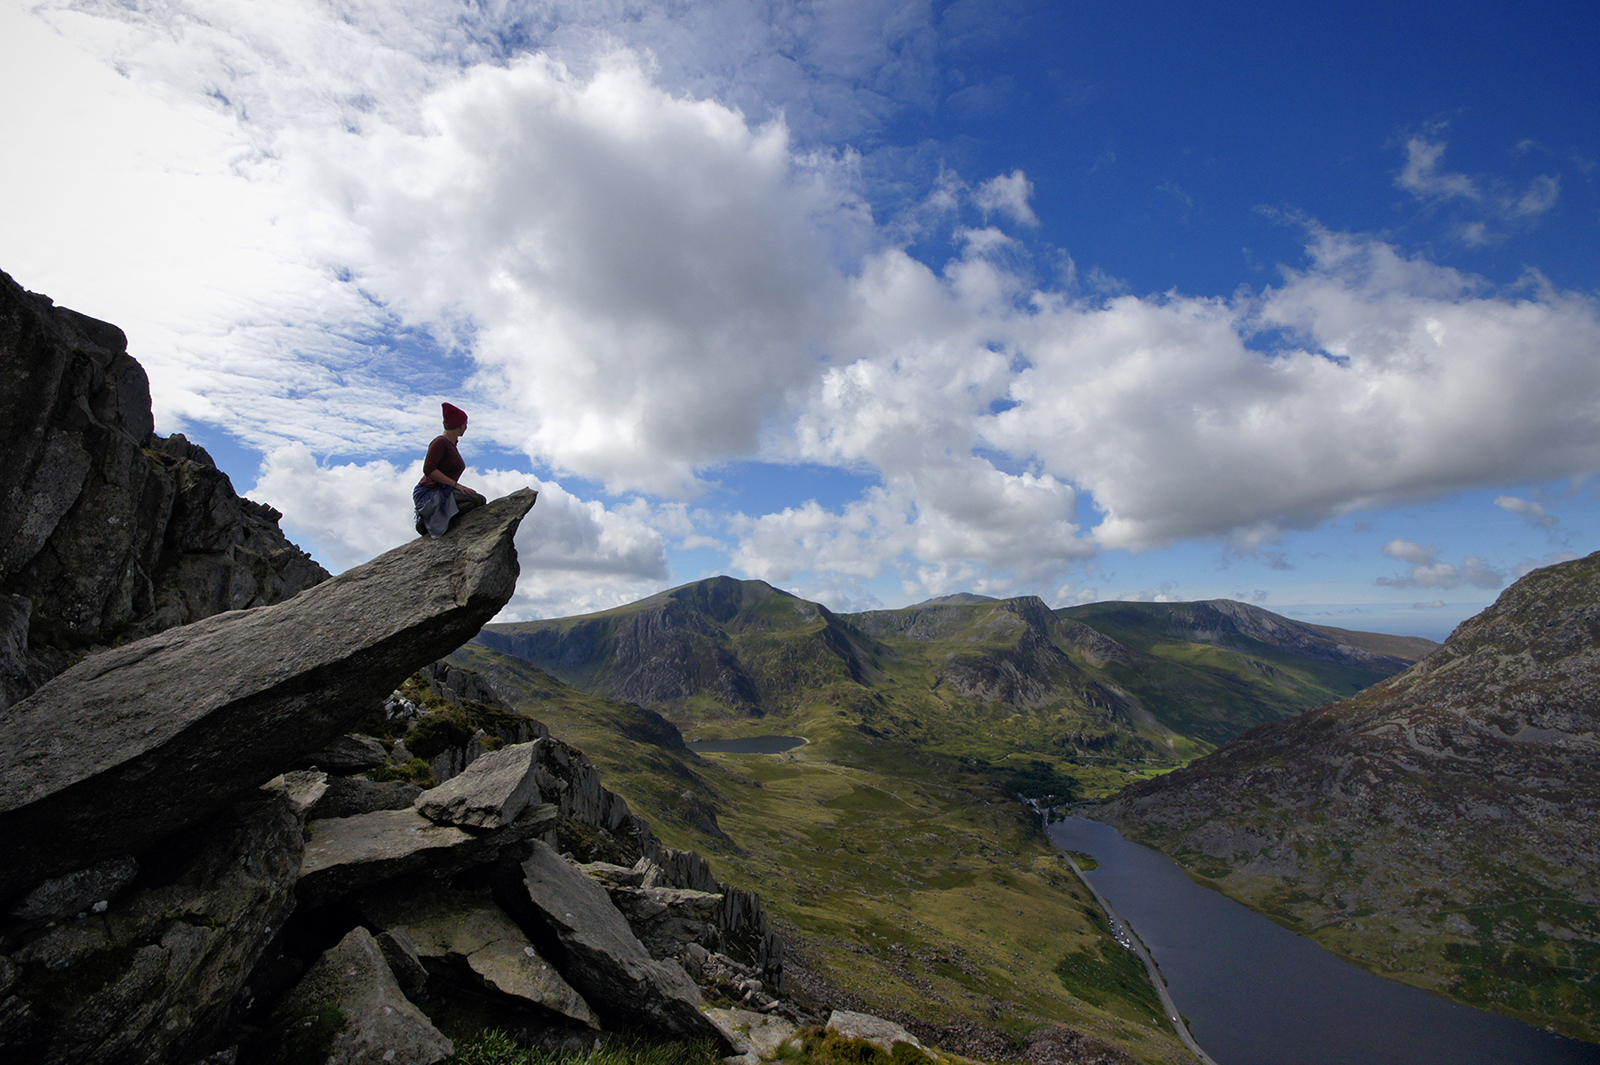 Kieran Rae Tryfan Glyderau Glyder Ogwen Valley Snowdonia Wales Cannon Stone Portrait